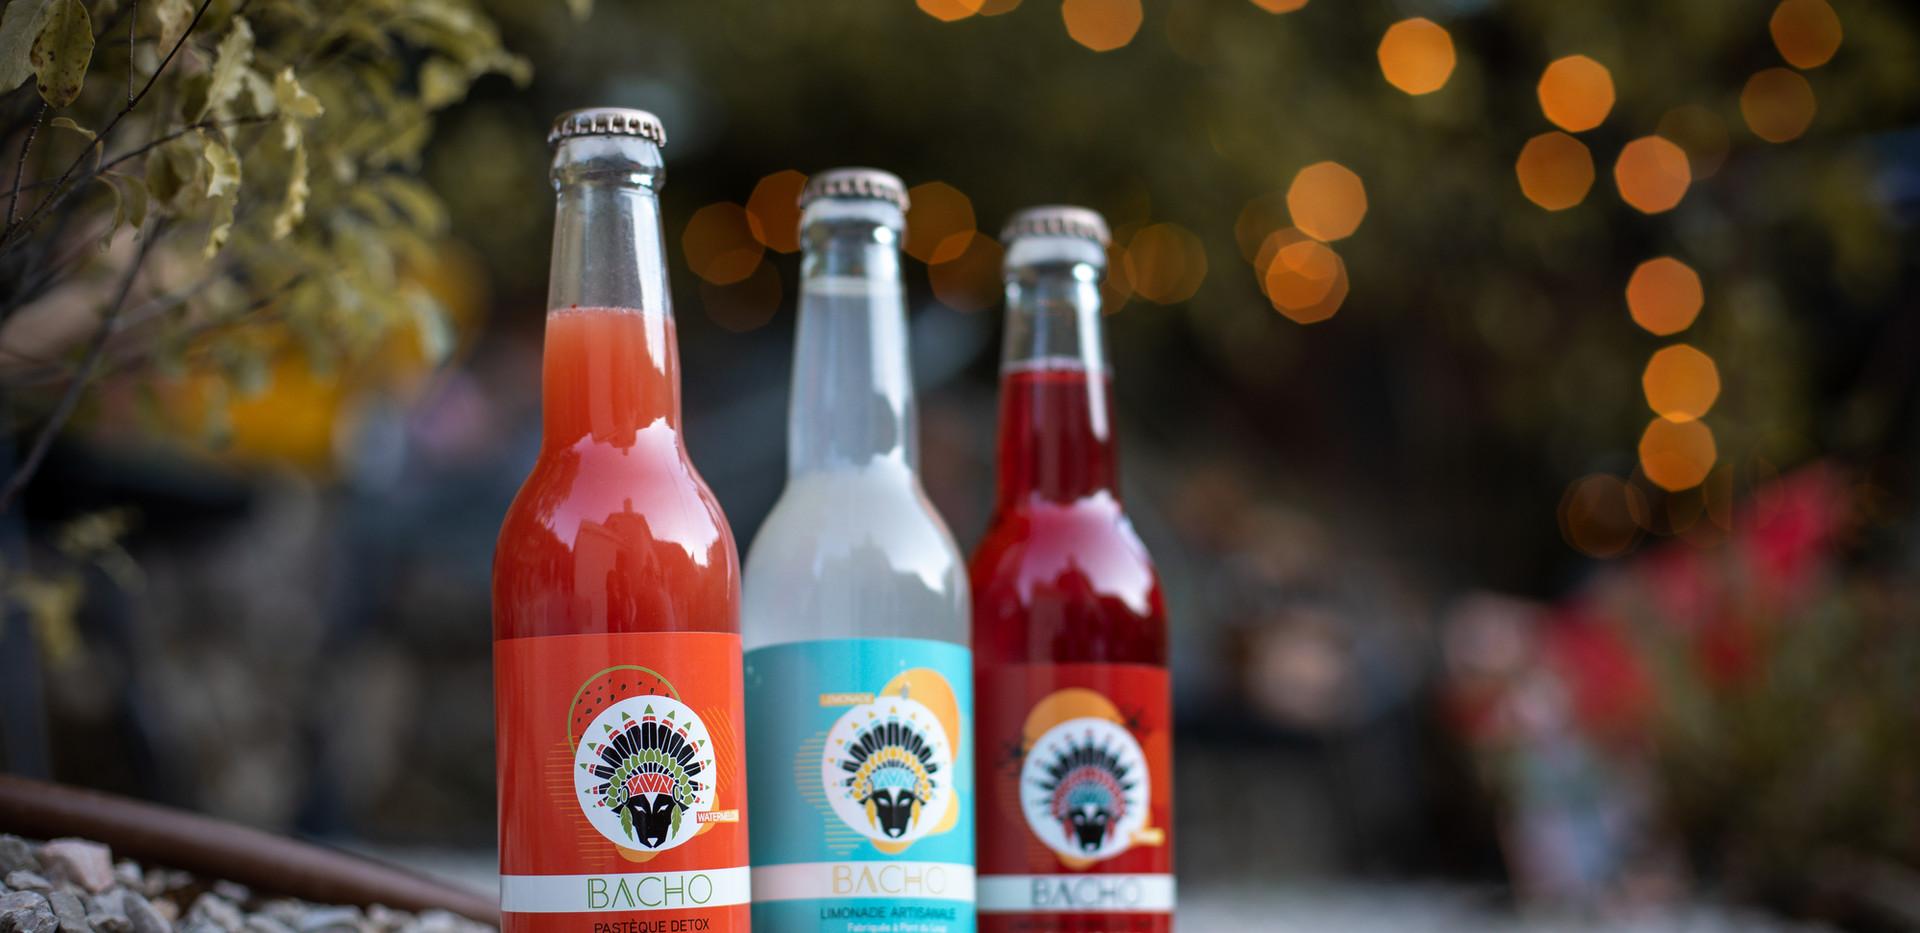 Limonade Artisanale Bacho Brewery